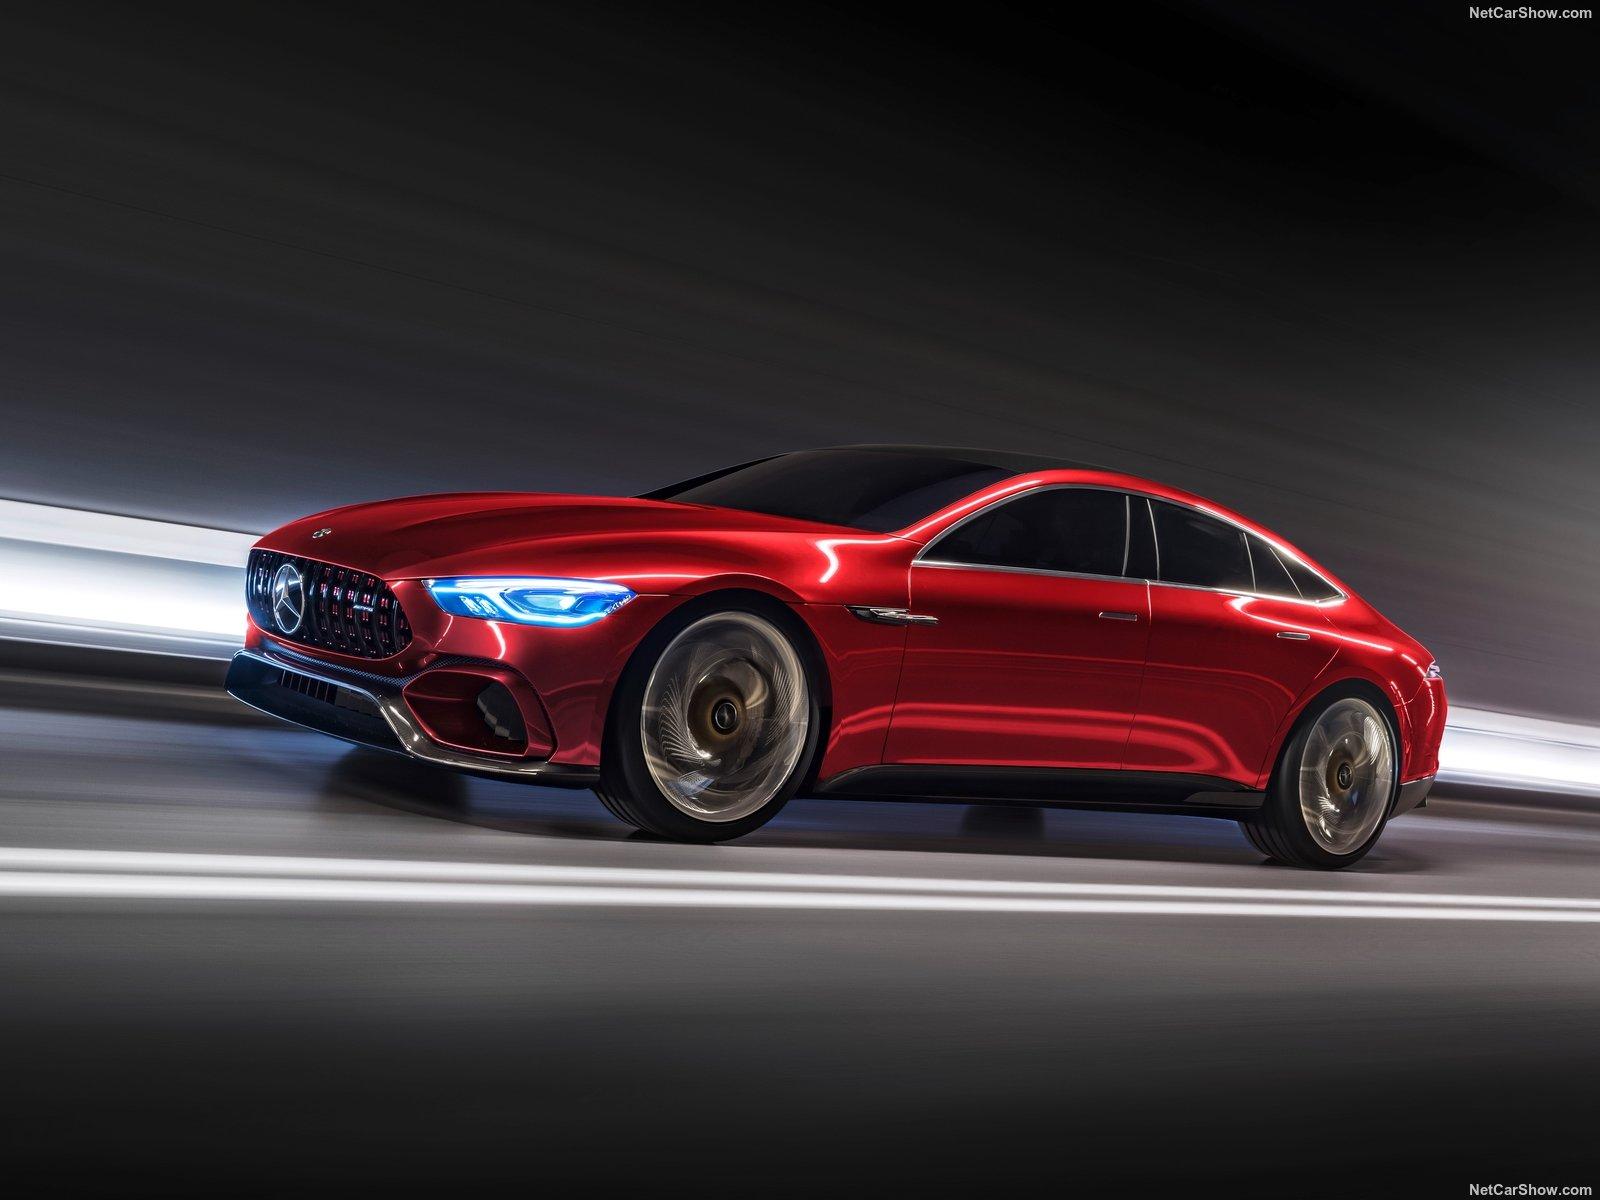 Mercedes-Benz-AMG_GT_Concept-2017-1600-04